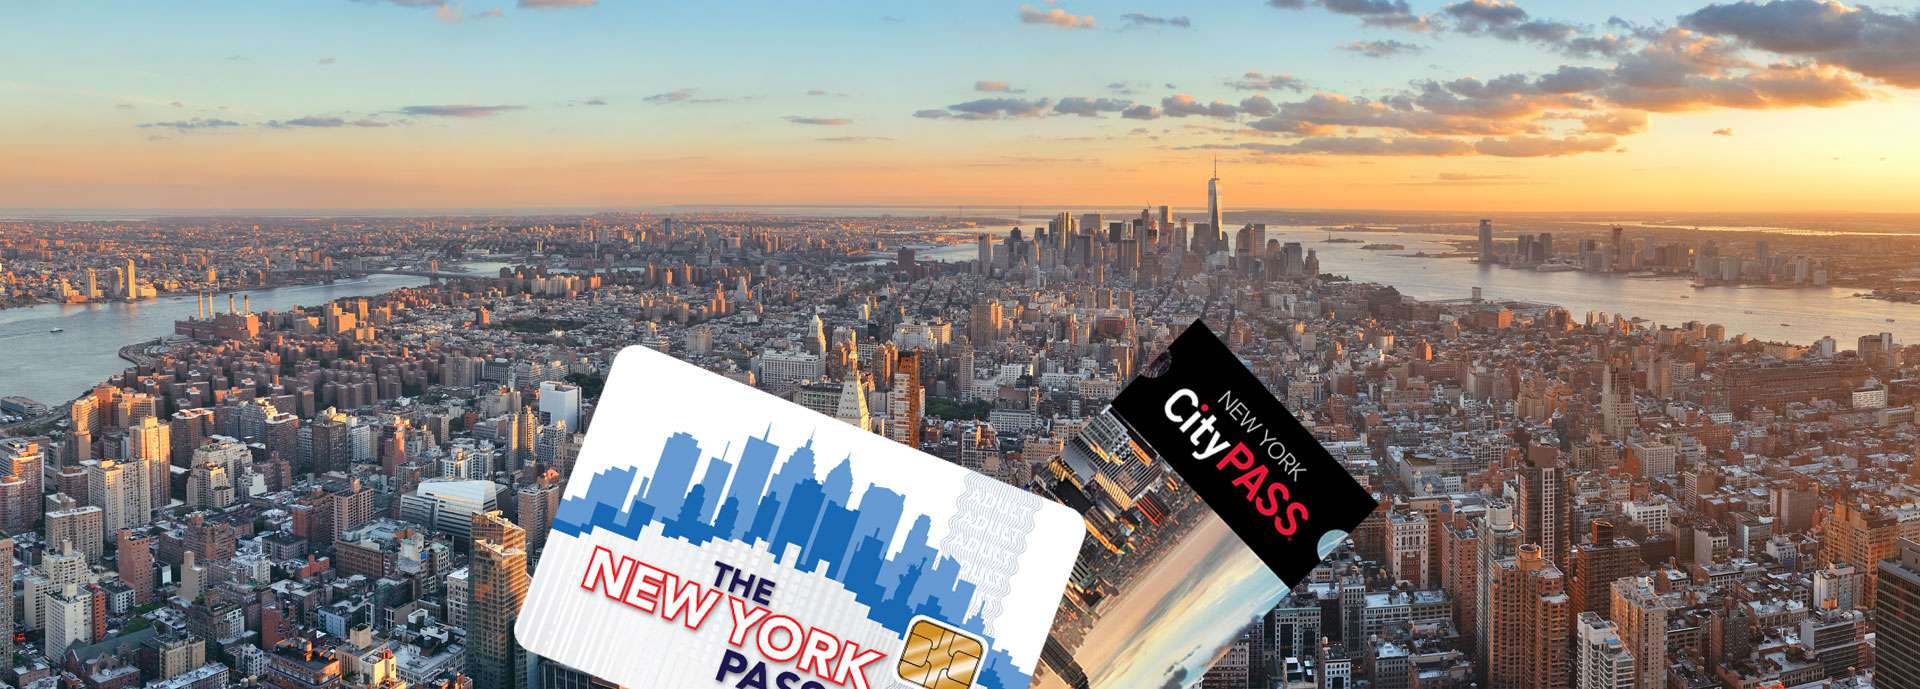 ▷ ¿New York Pass o City Pass? ¡La comparación más completa!